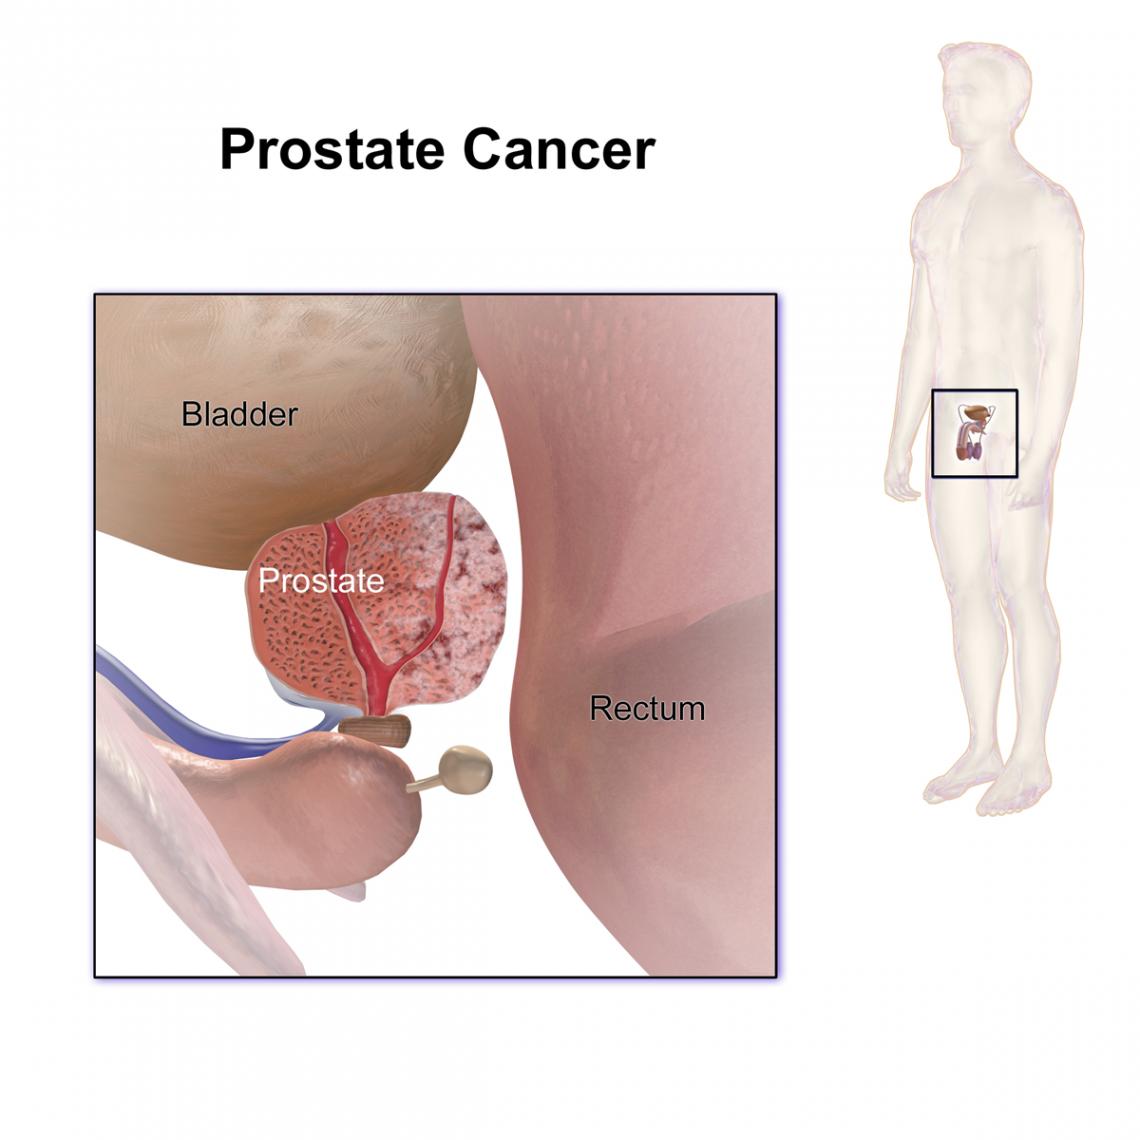 diferentes tipos de biopsia de próstata